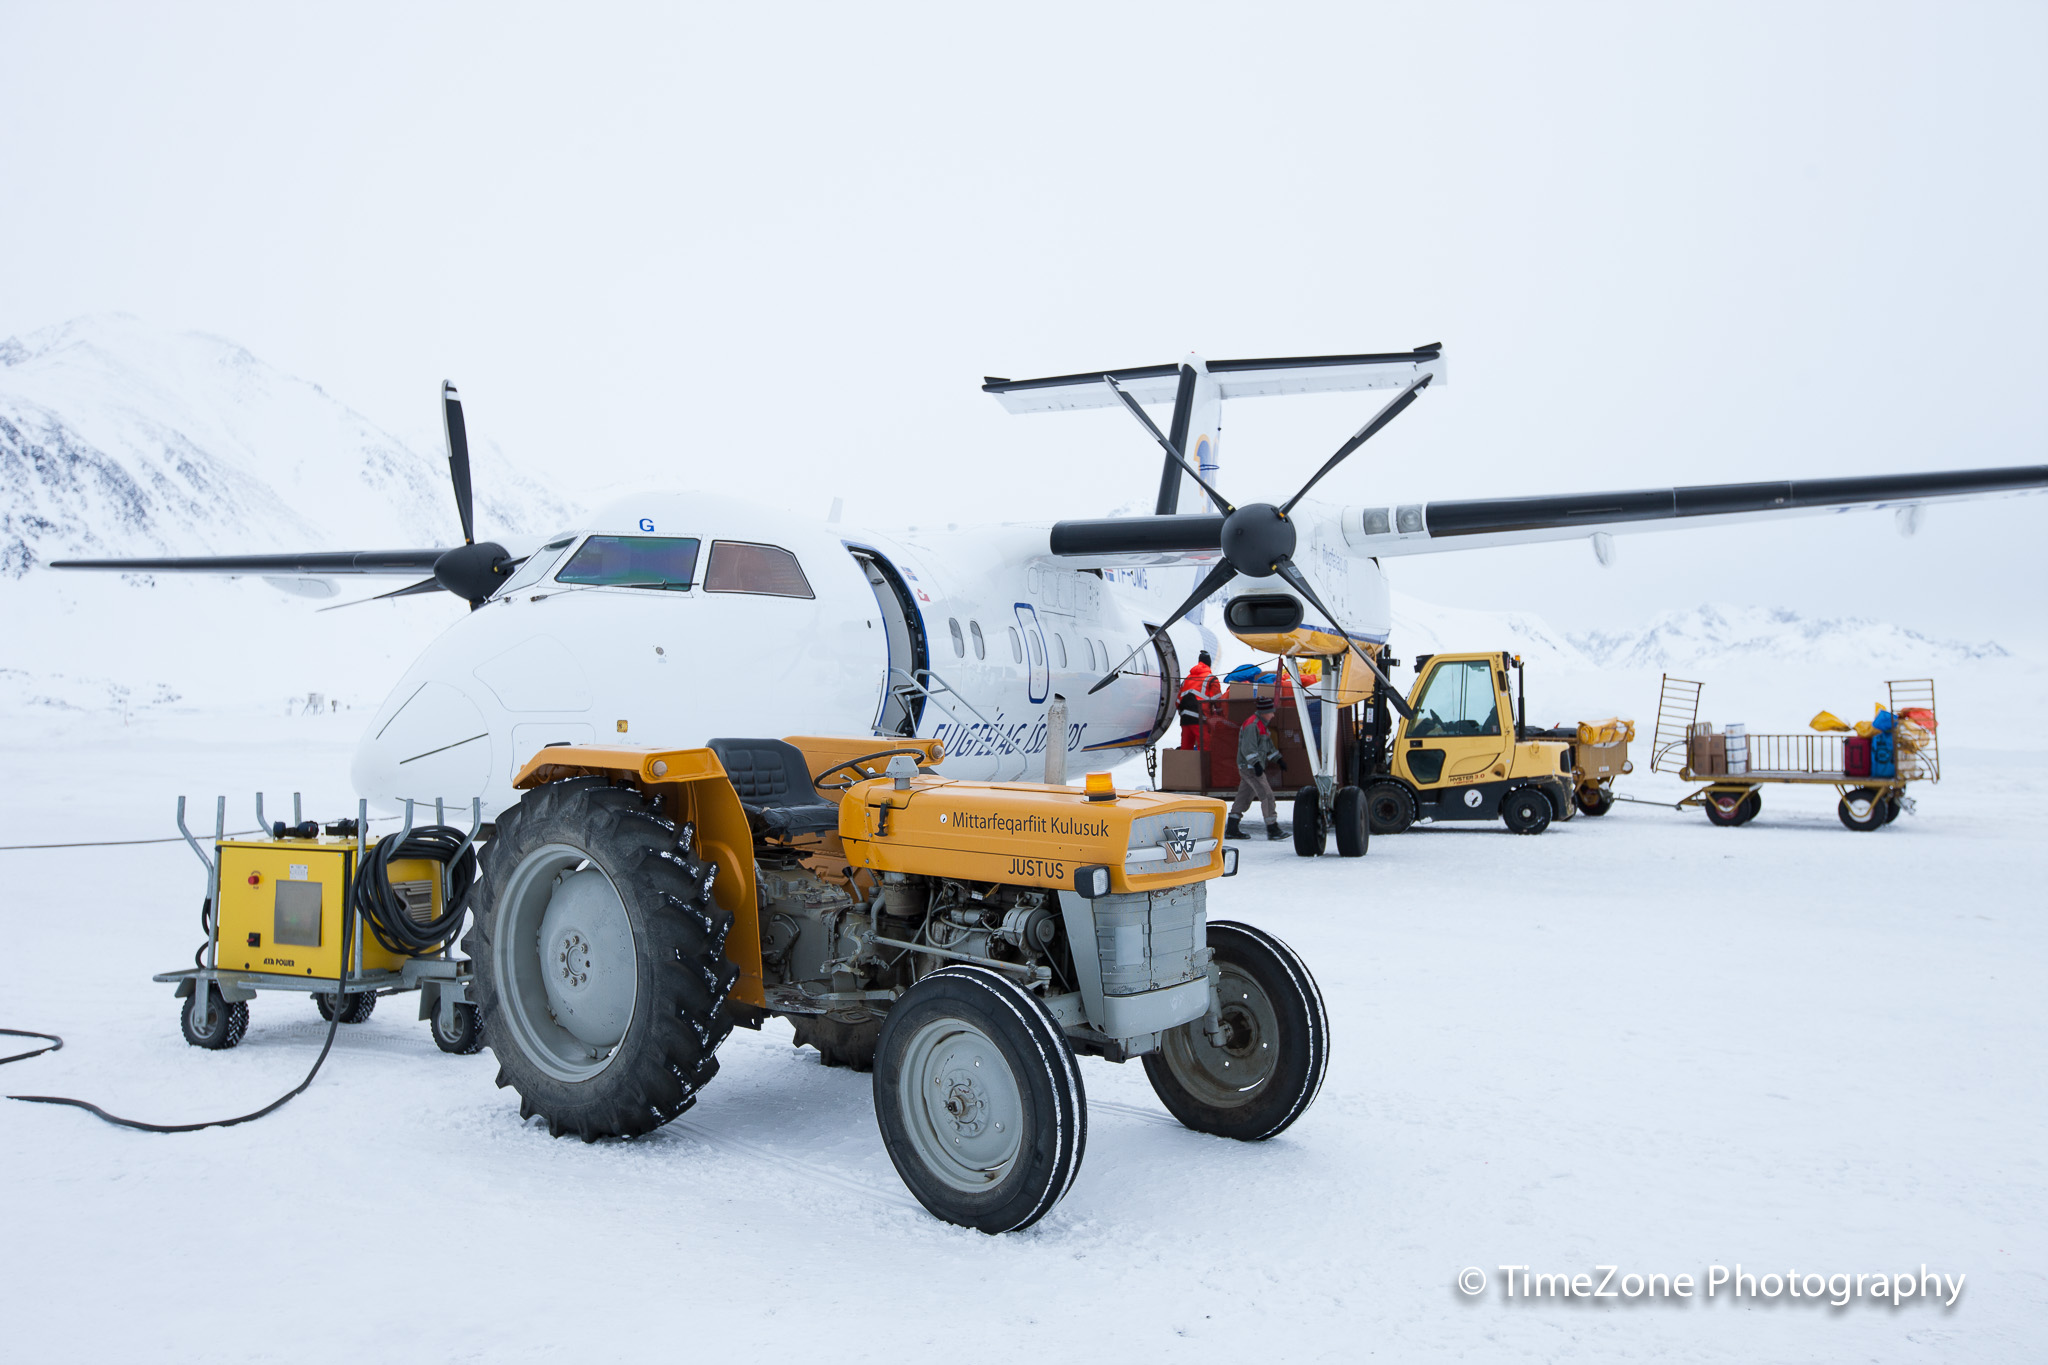 Air Iceland De Havilland Dash 8-200 unloaded at Kulusuk on January 28th 2015.